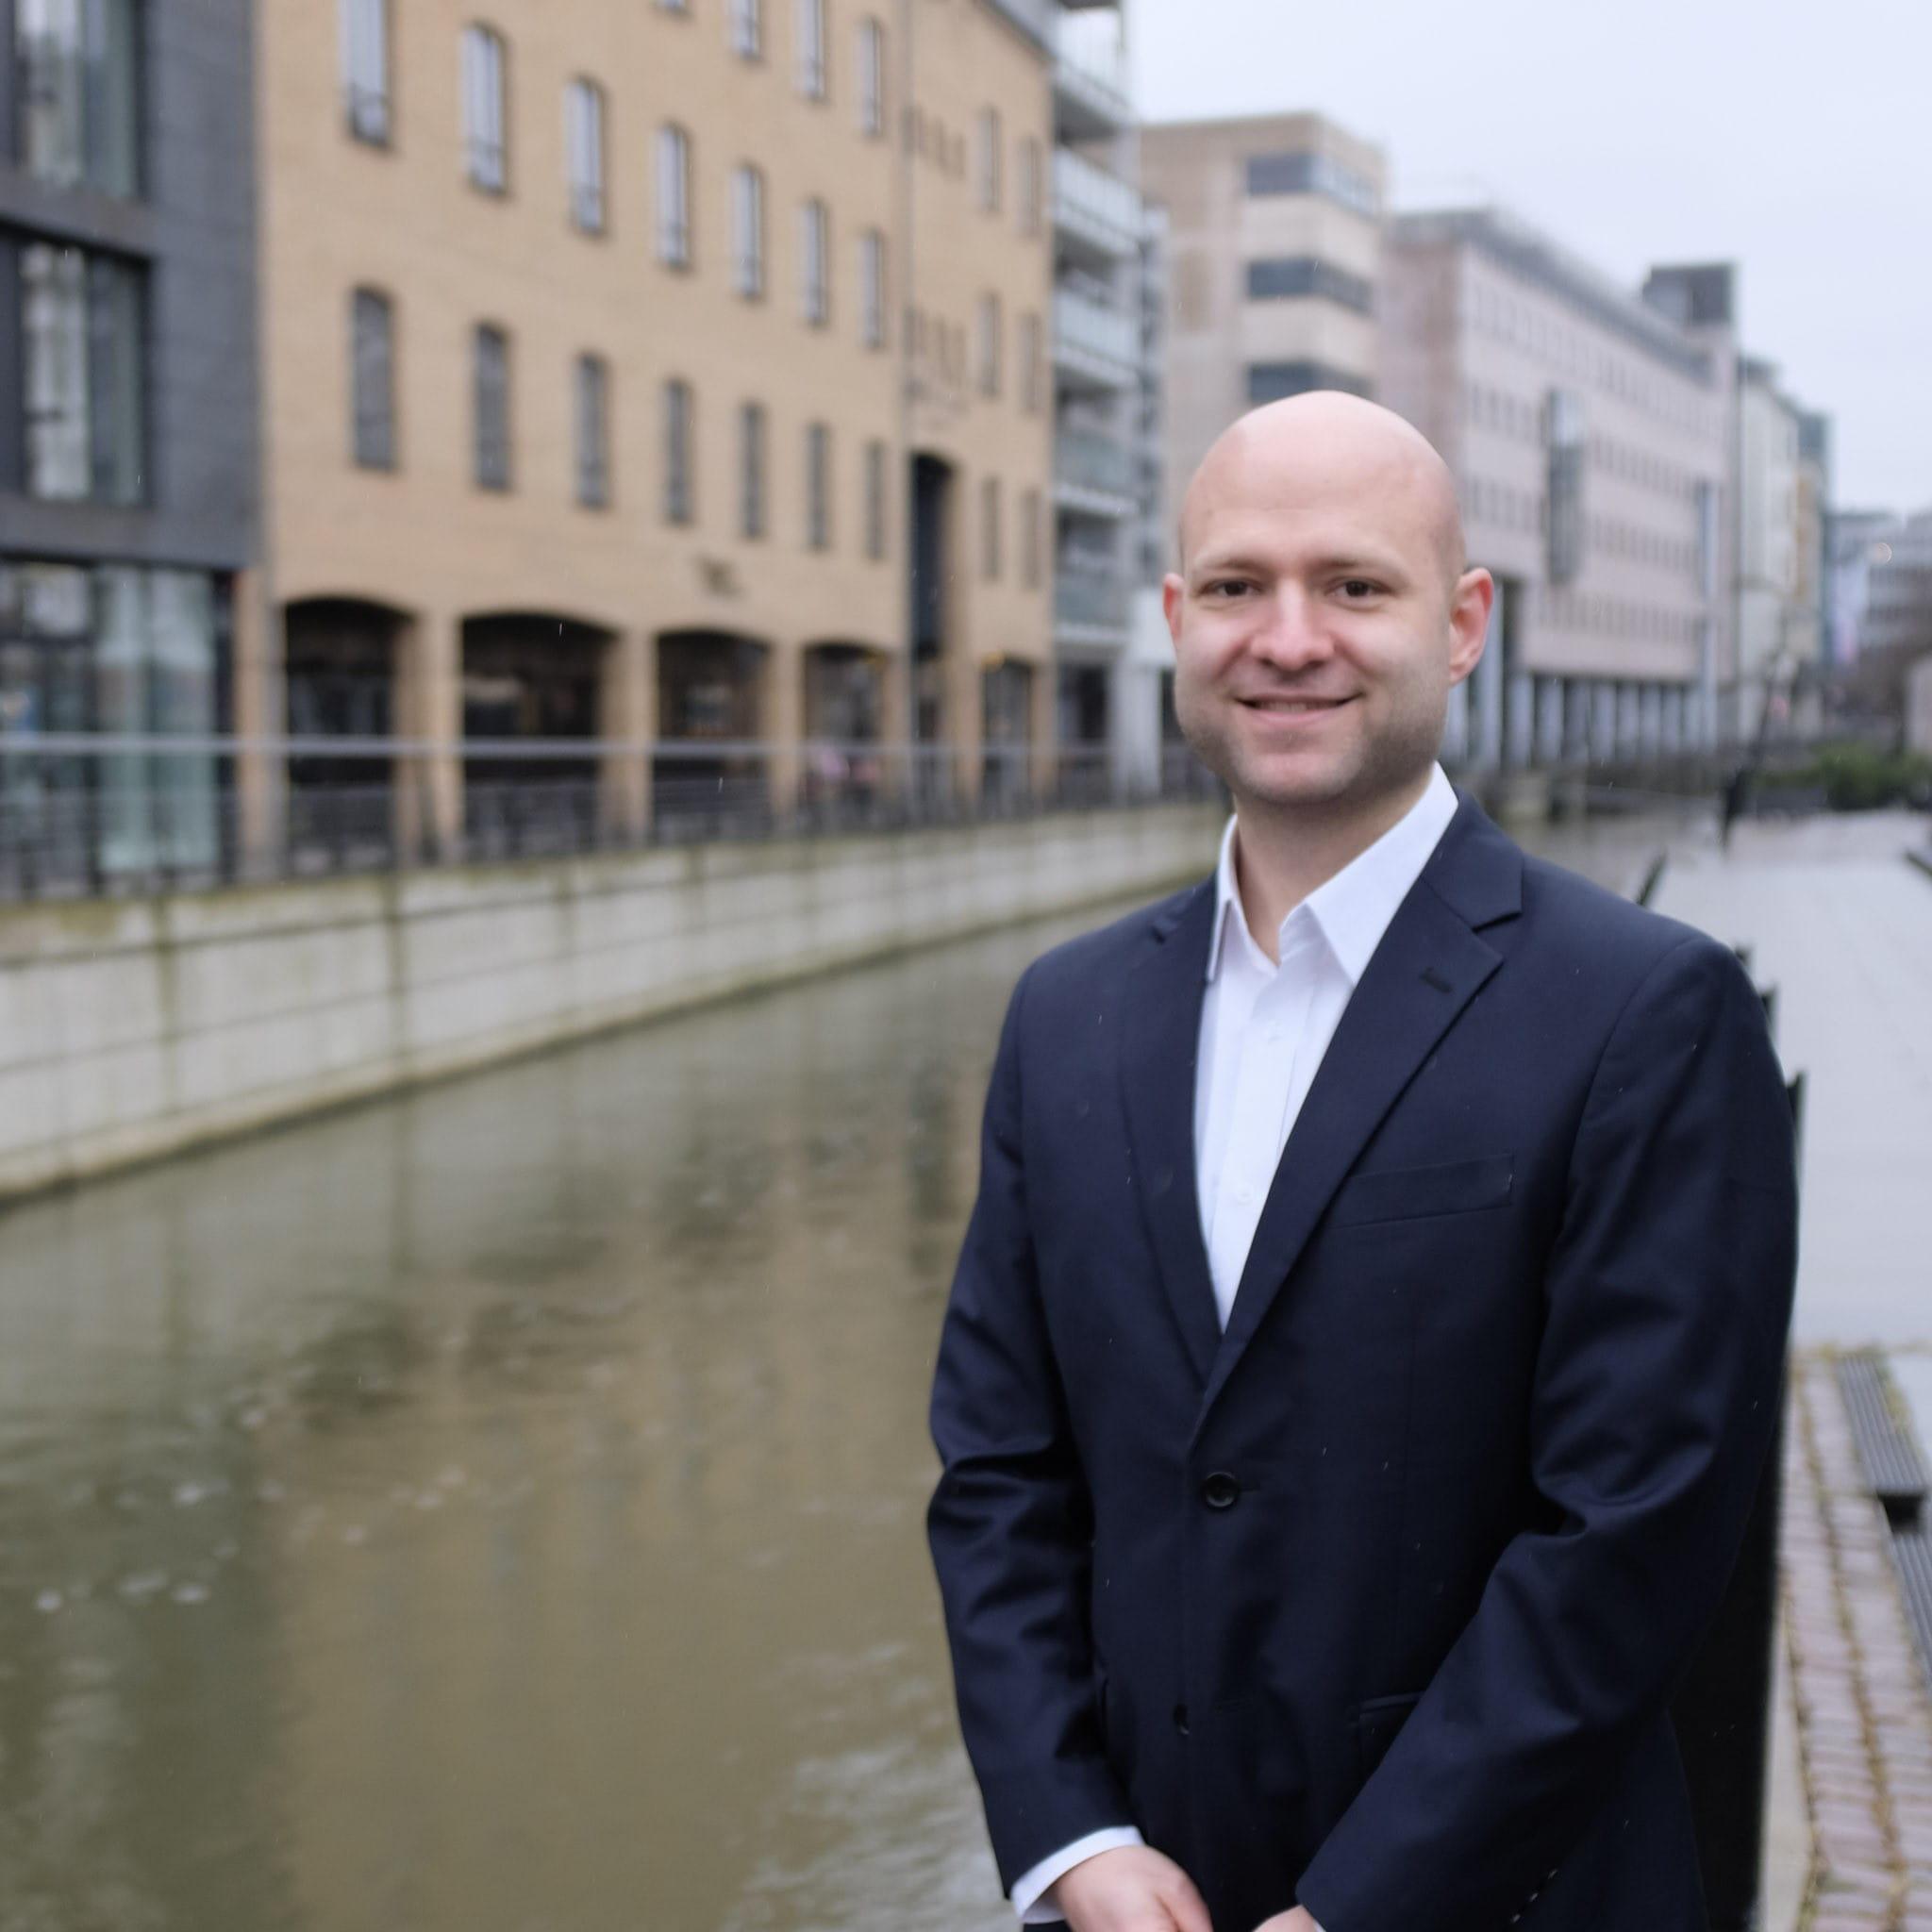 Flemming Kaasgard, Executive Director